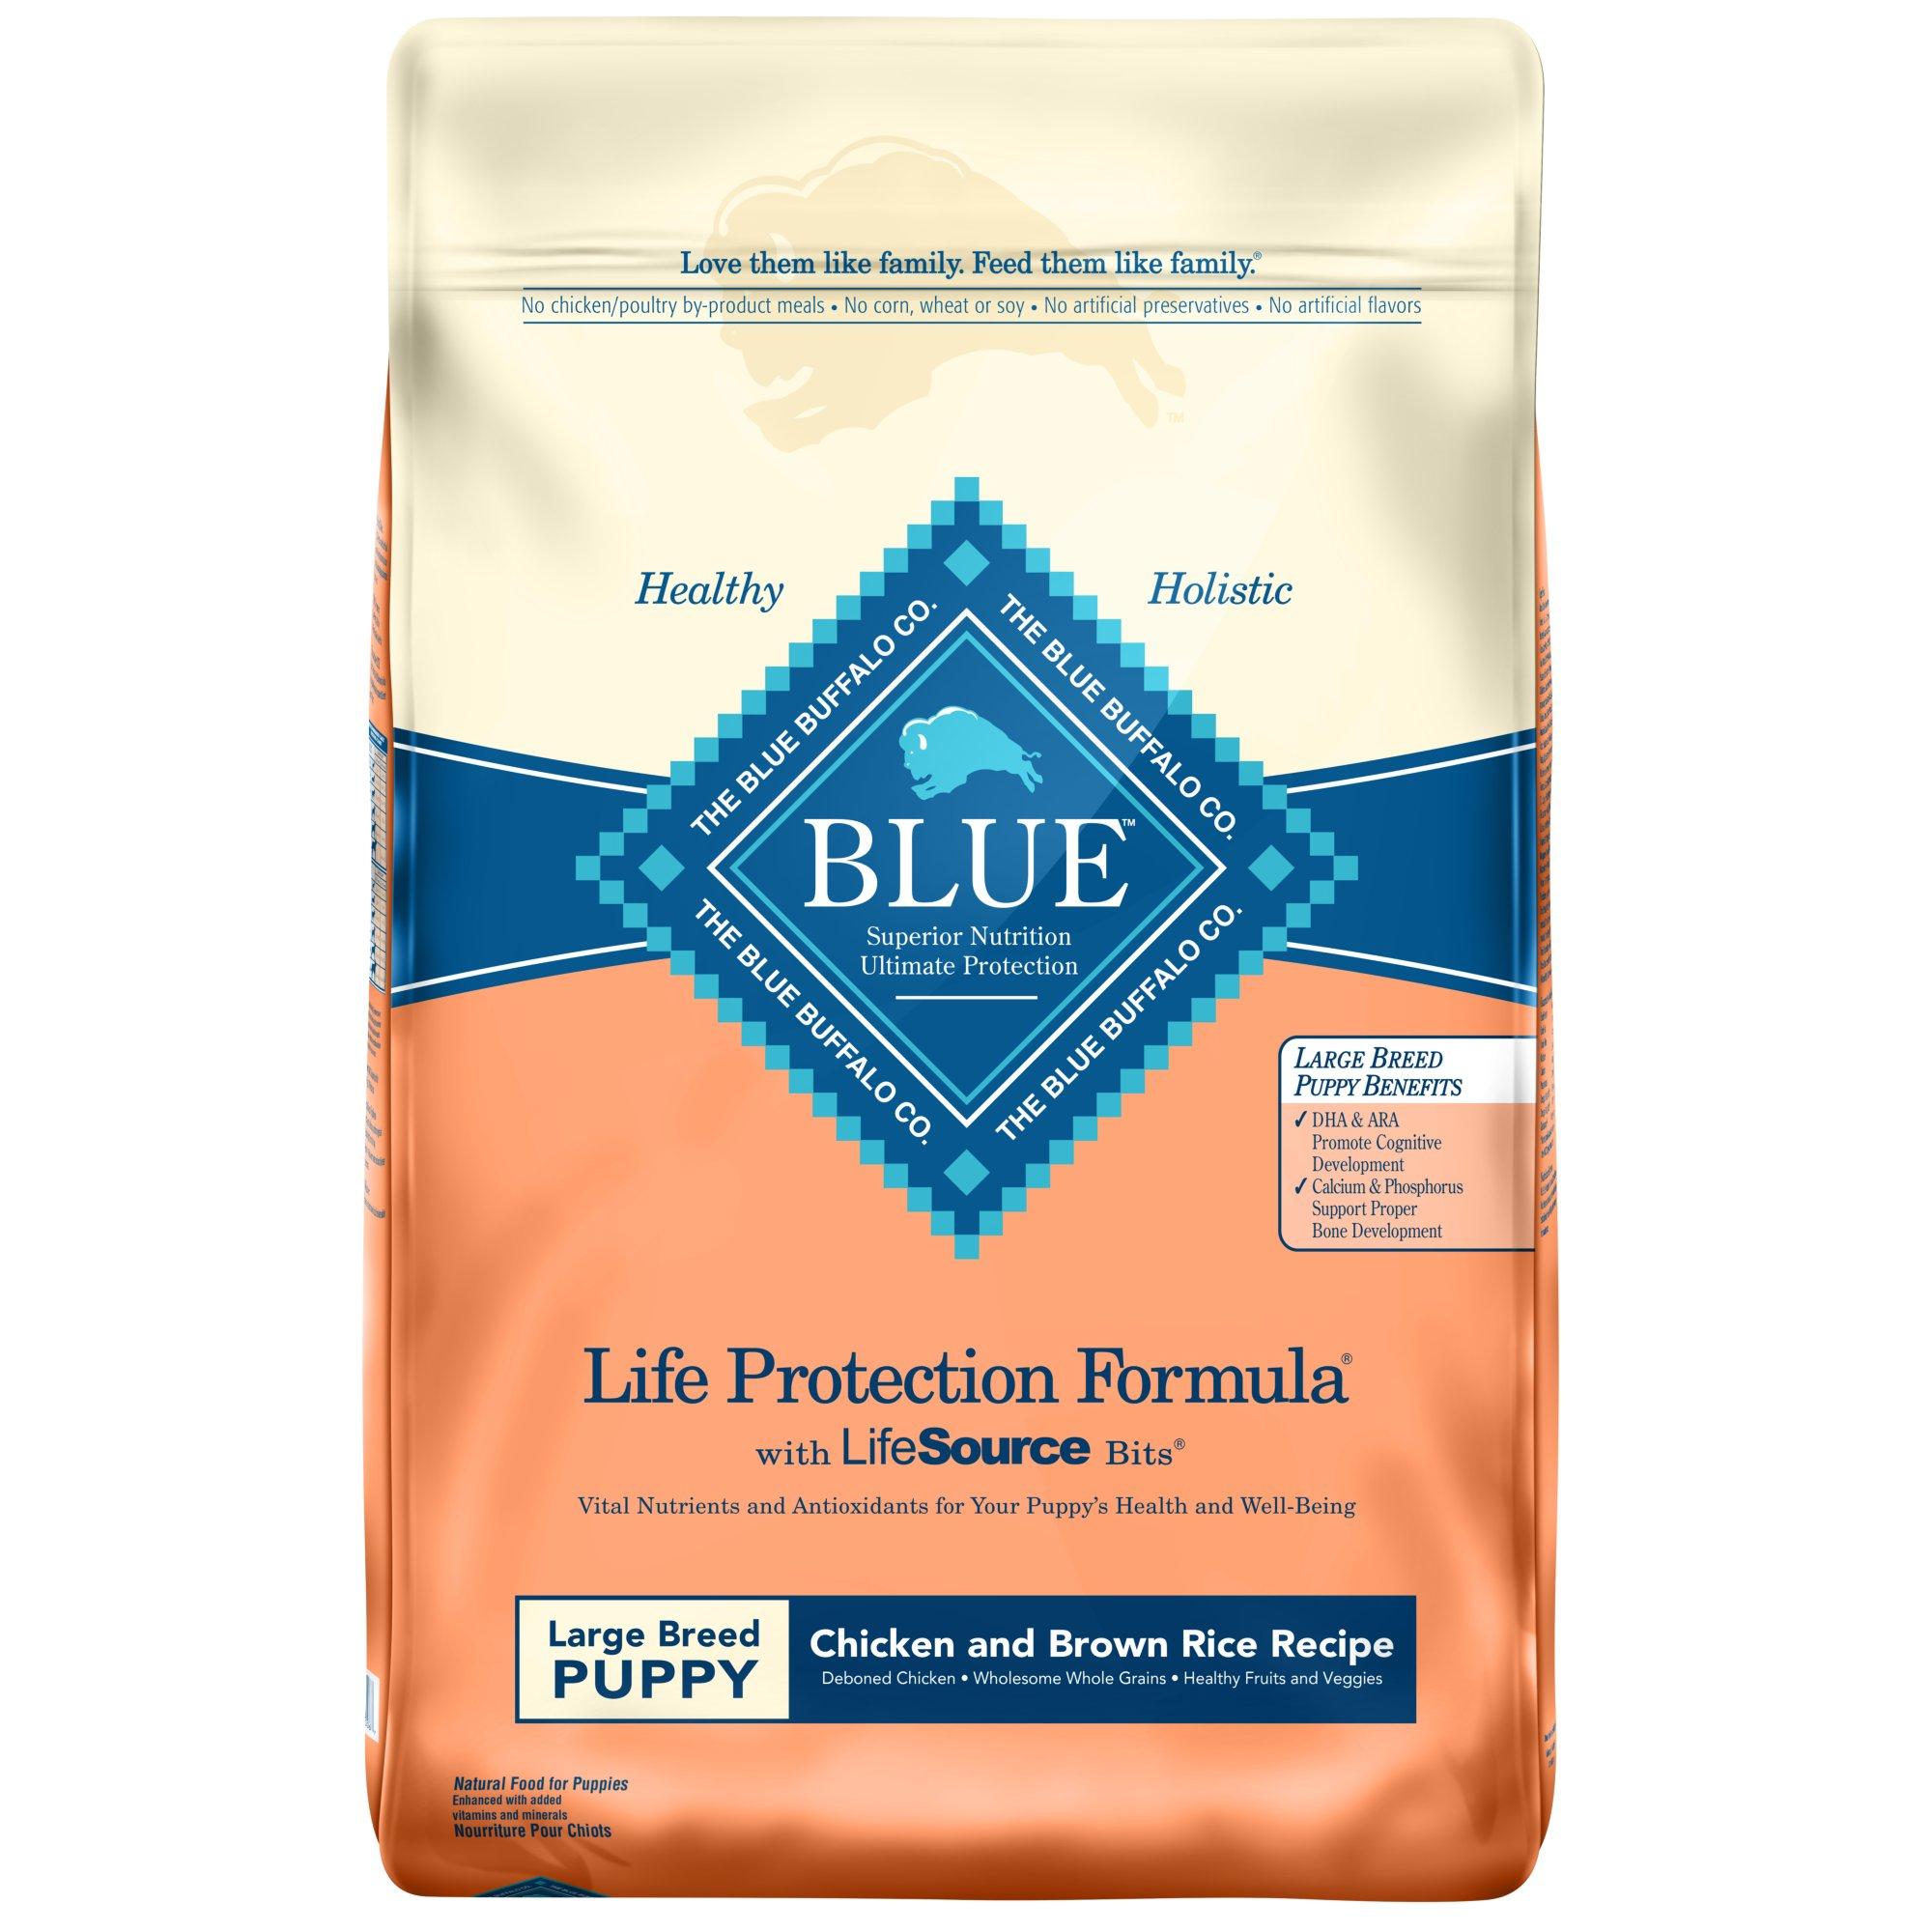 Blue Life Protection Formula Cat Food